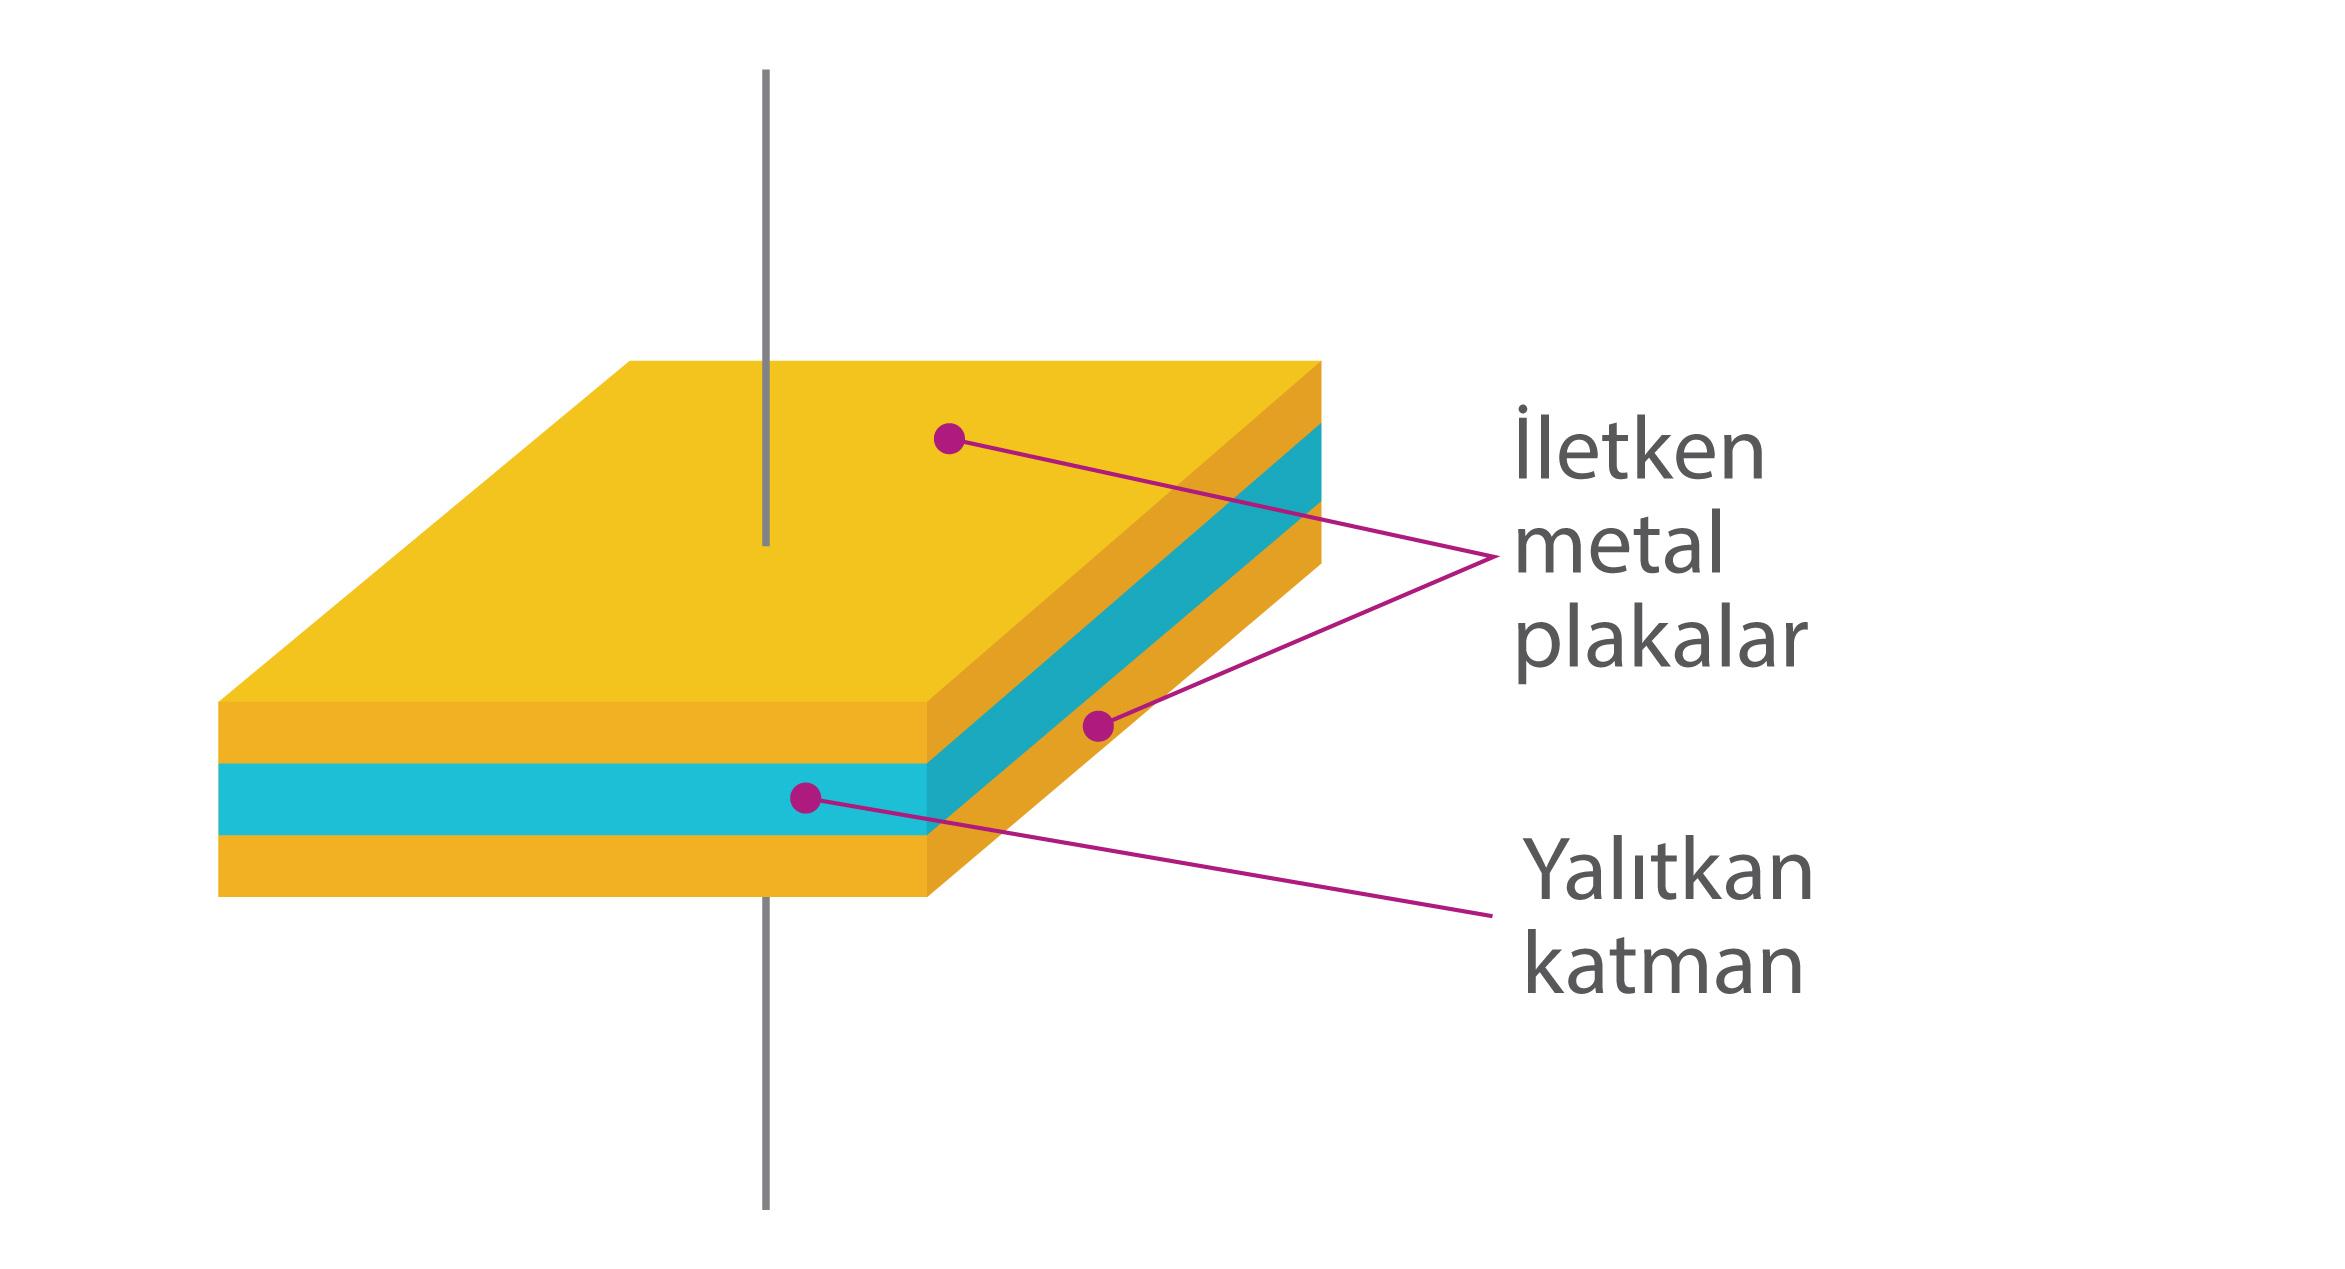 data-cke-saved-src=http://www.bilimgenc.tubitak.gov.tr/sites/default/files/kapasitorler_yalitkanlar.jpg